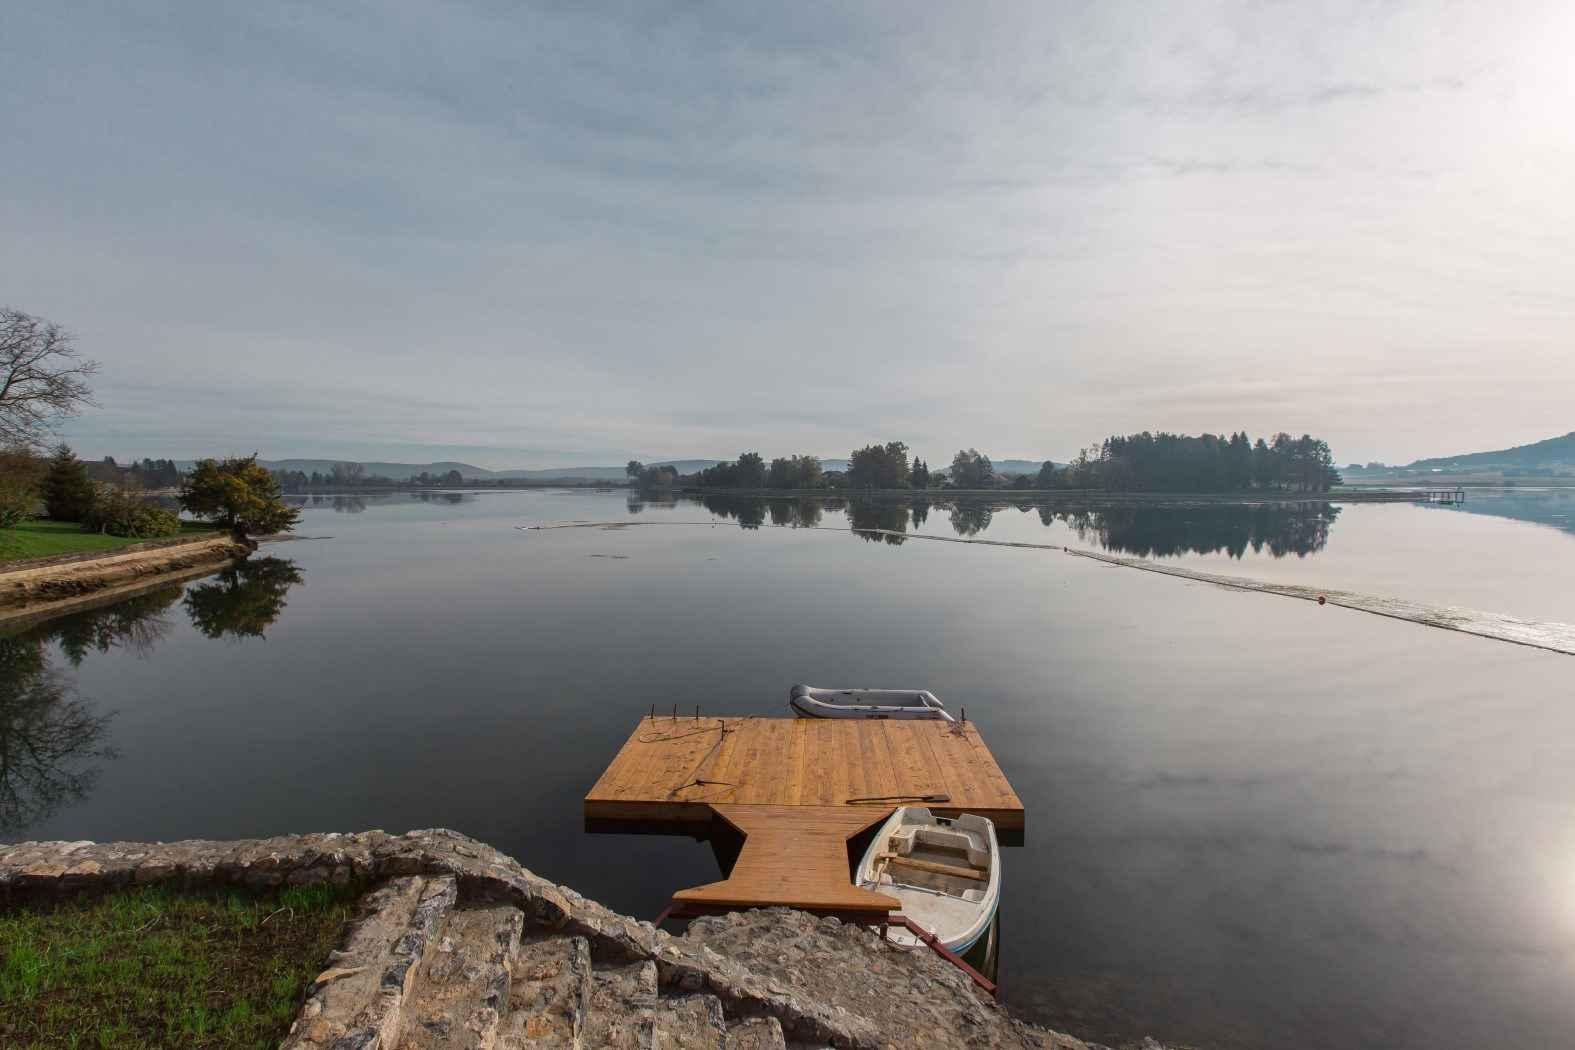 Ferienhaus mit Pool am See gelegen (2047240), Ogulin, , Mittelkroatien, Kroatien, Bild 12